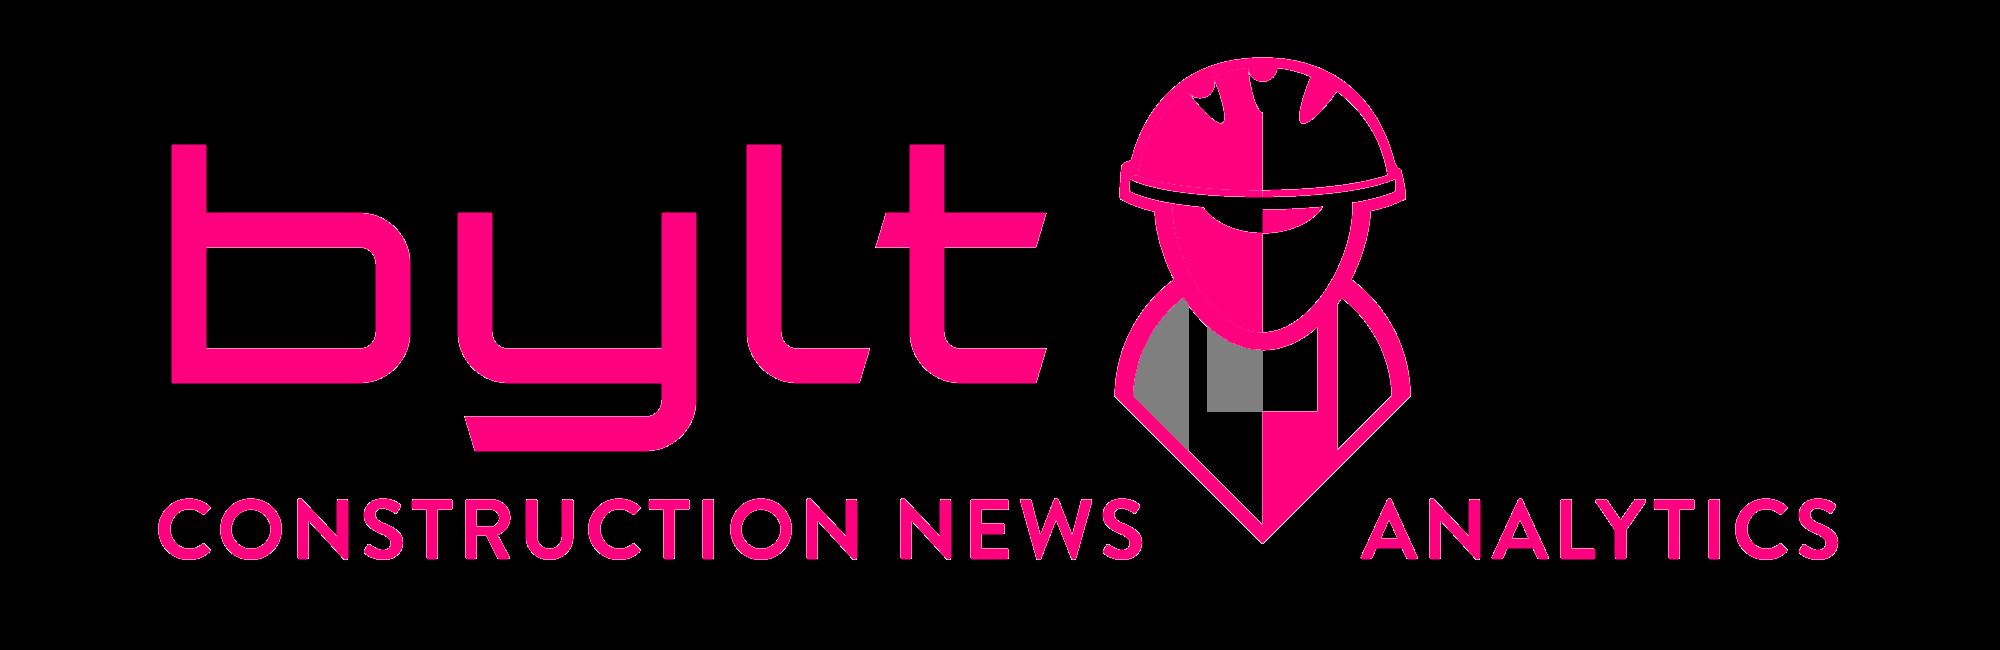 BYLT: Construction & Infrastructure News, Data & Analytics